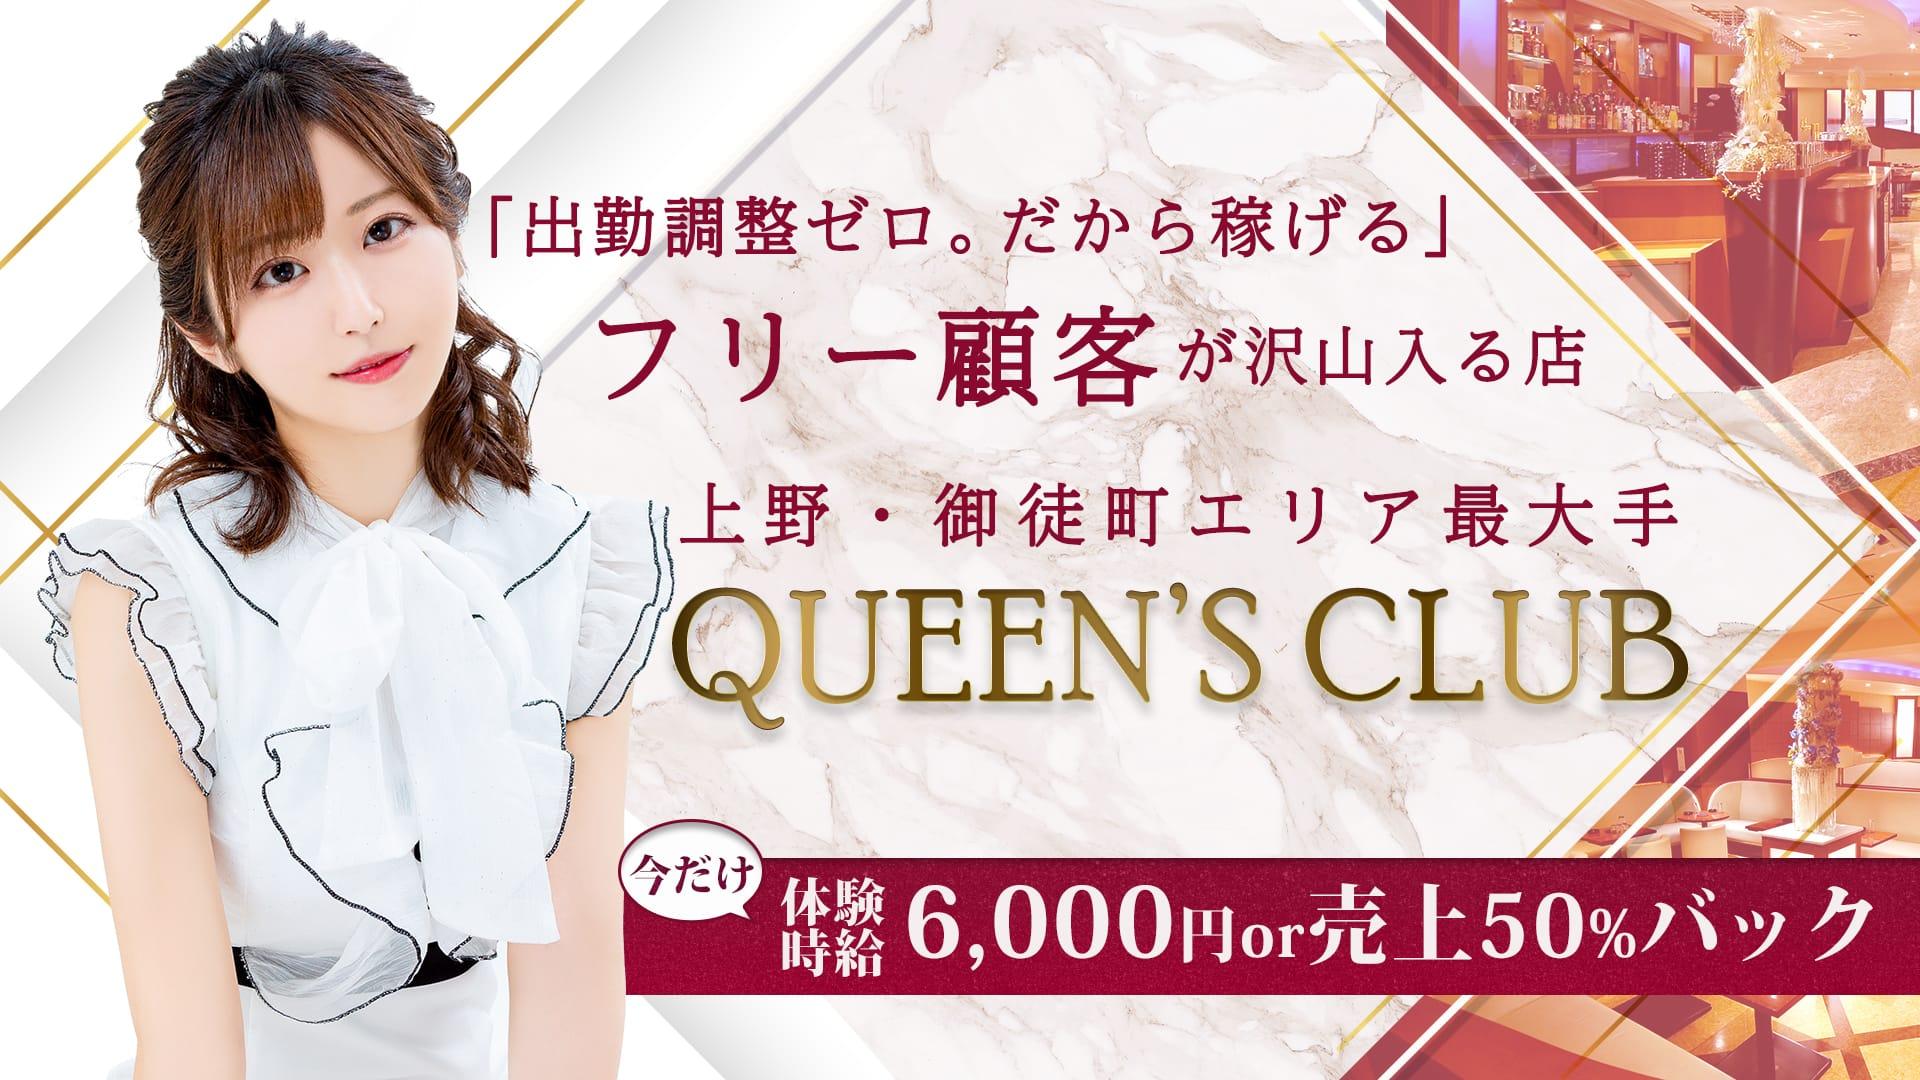 QUEEN'S CLUB(クイーンズクラブ)【公式求人・体入情報】 上野キャバクラ TOP画像